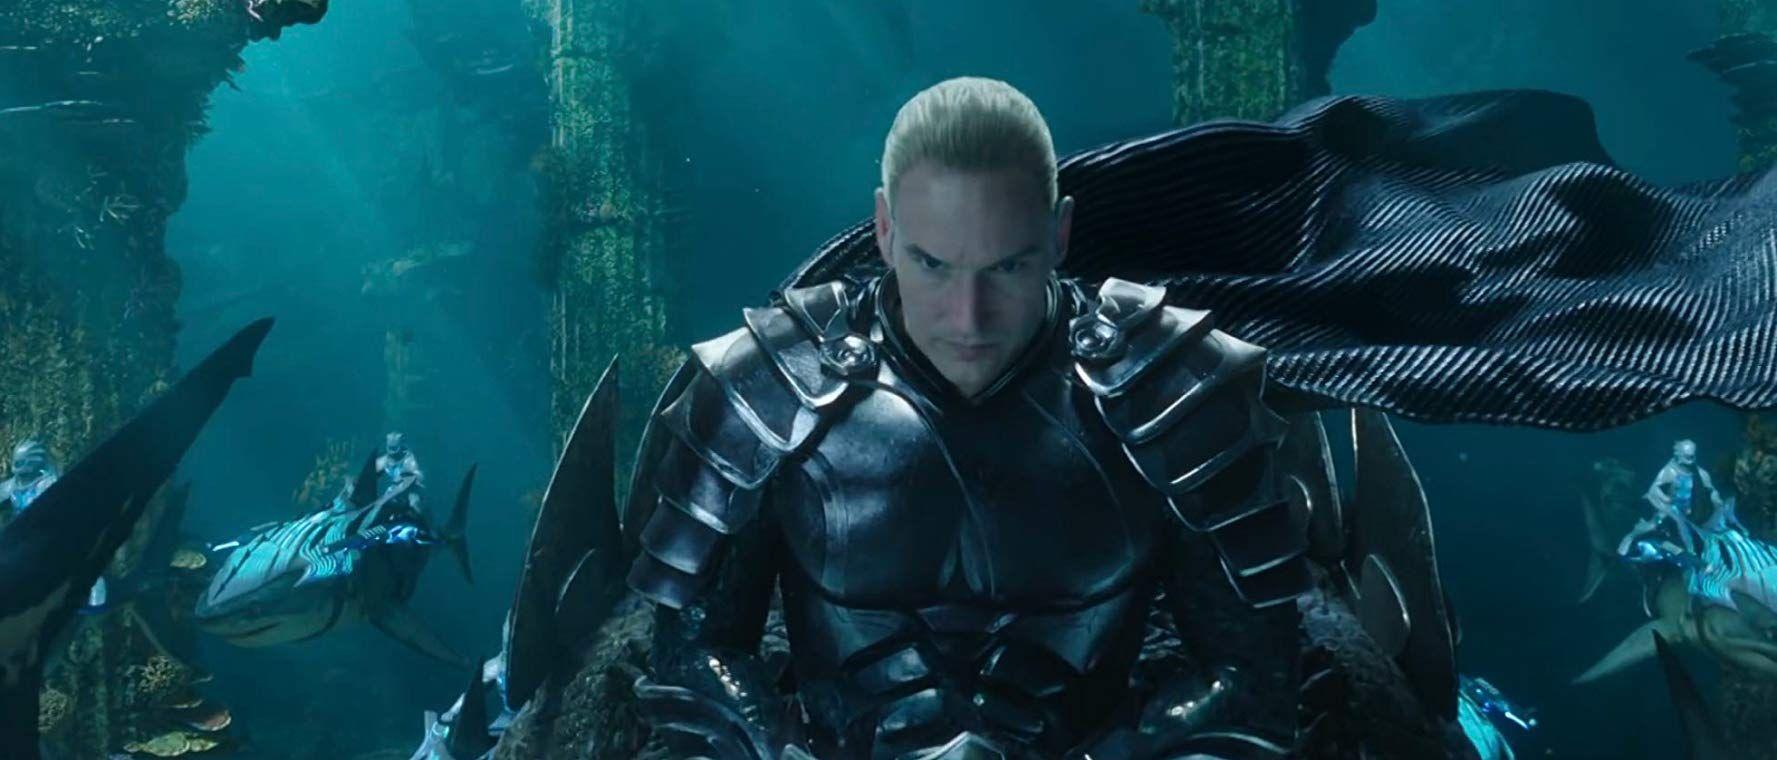 Aquaman 2 Will Bring Back Patrick Wilson as Ocean Master - Collider.com